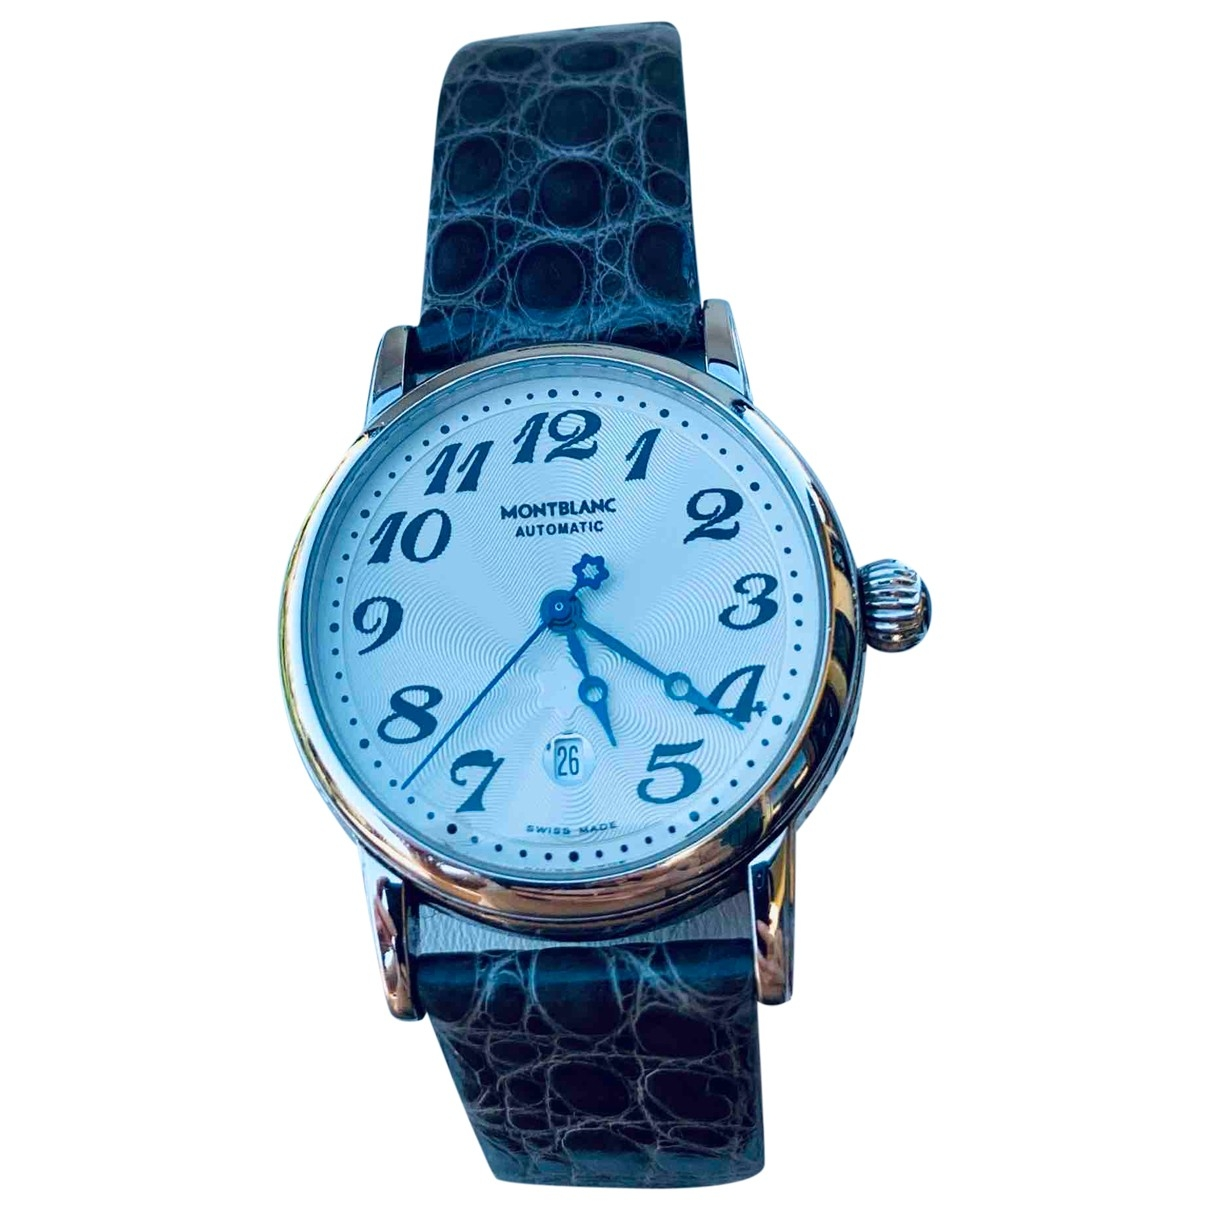 Reloj Meisterstuck Montblanc